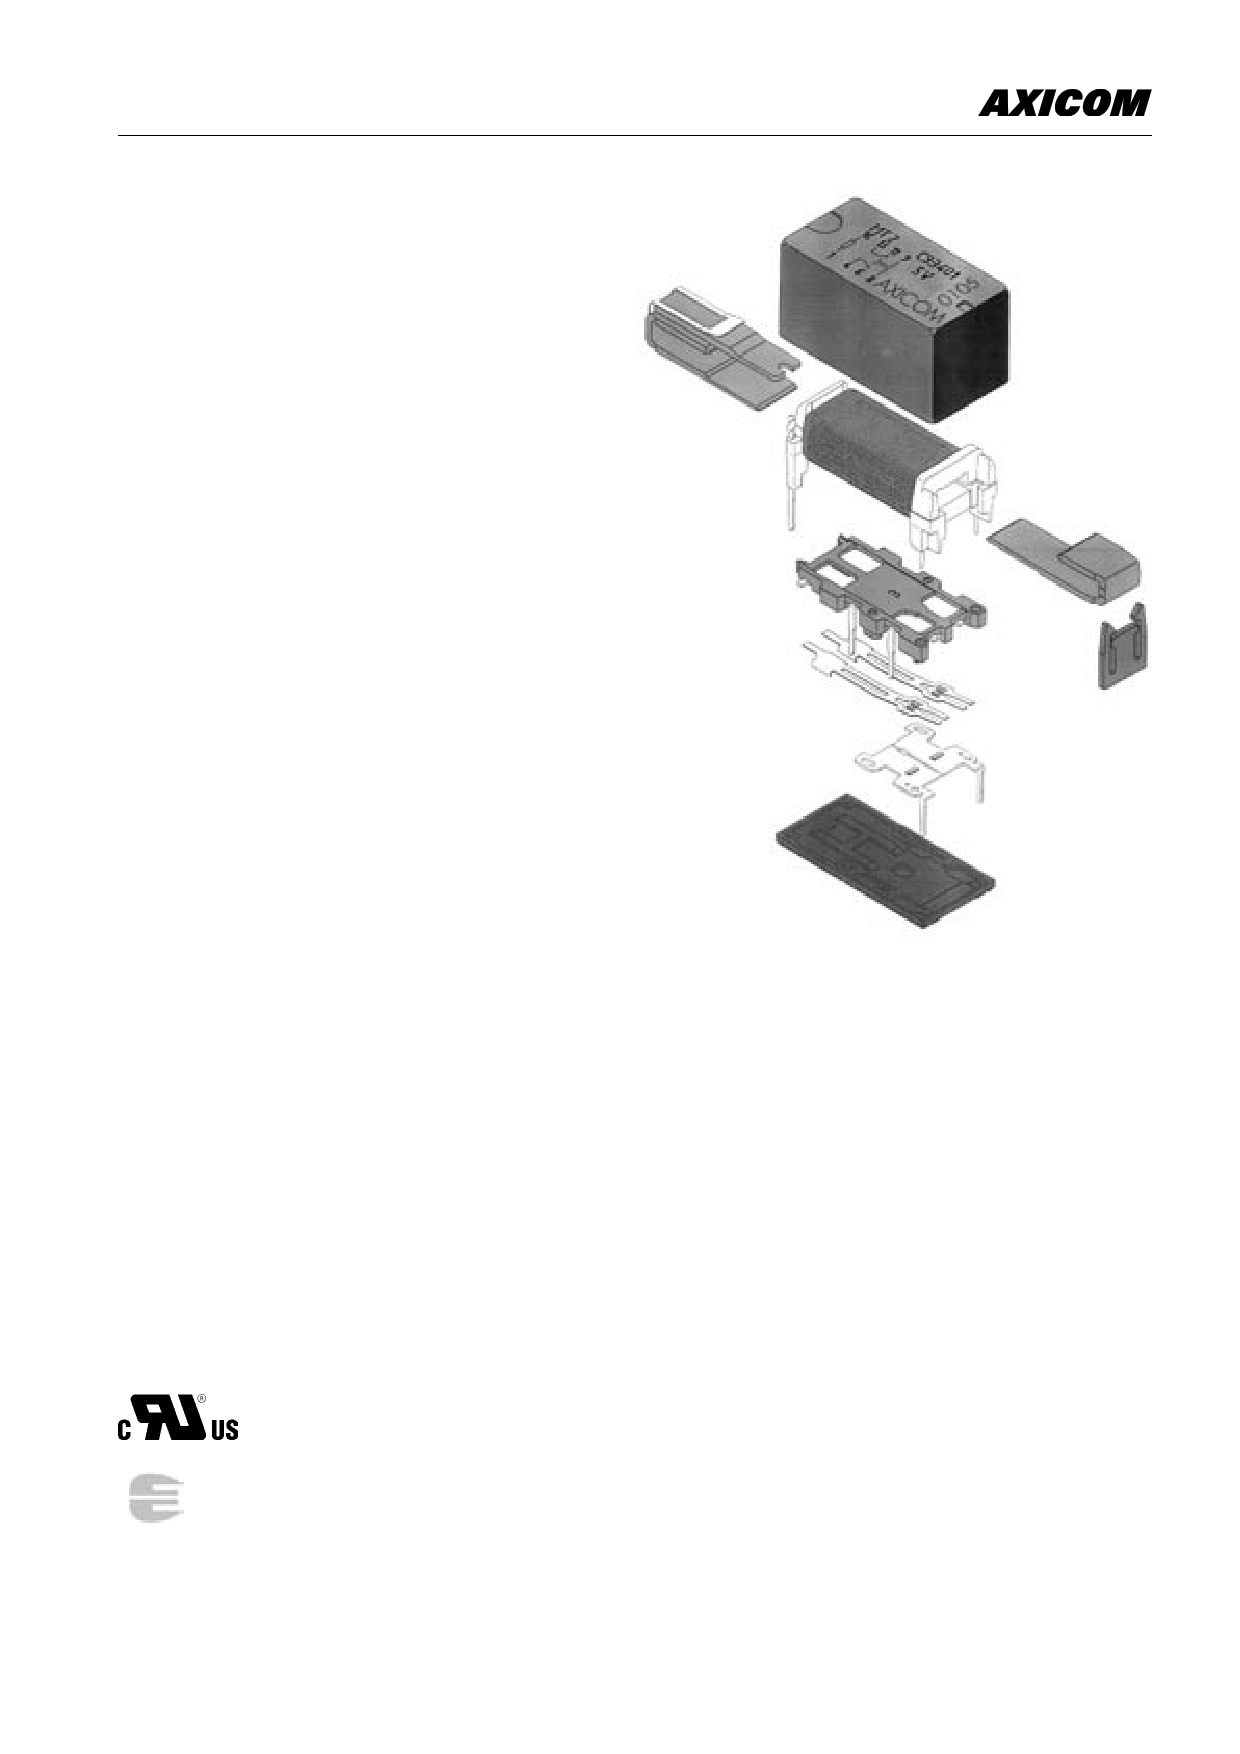 1-1462001-1 Даташит, Описание, Даташиты